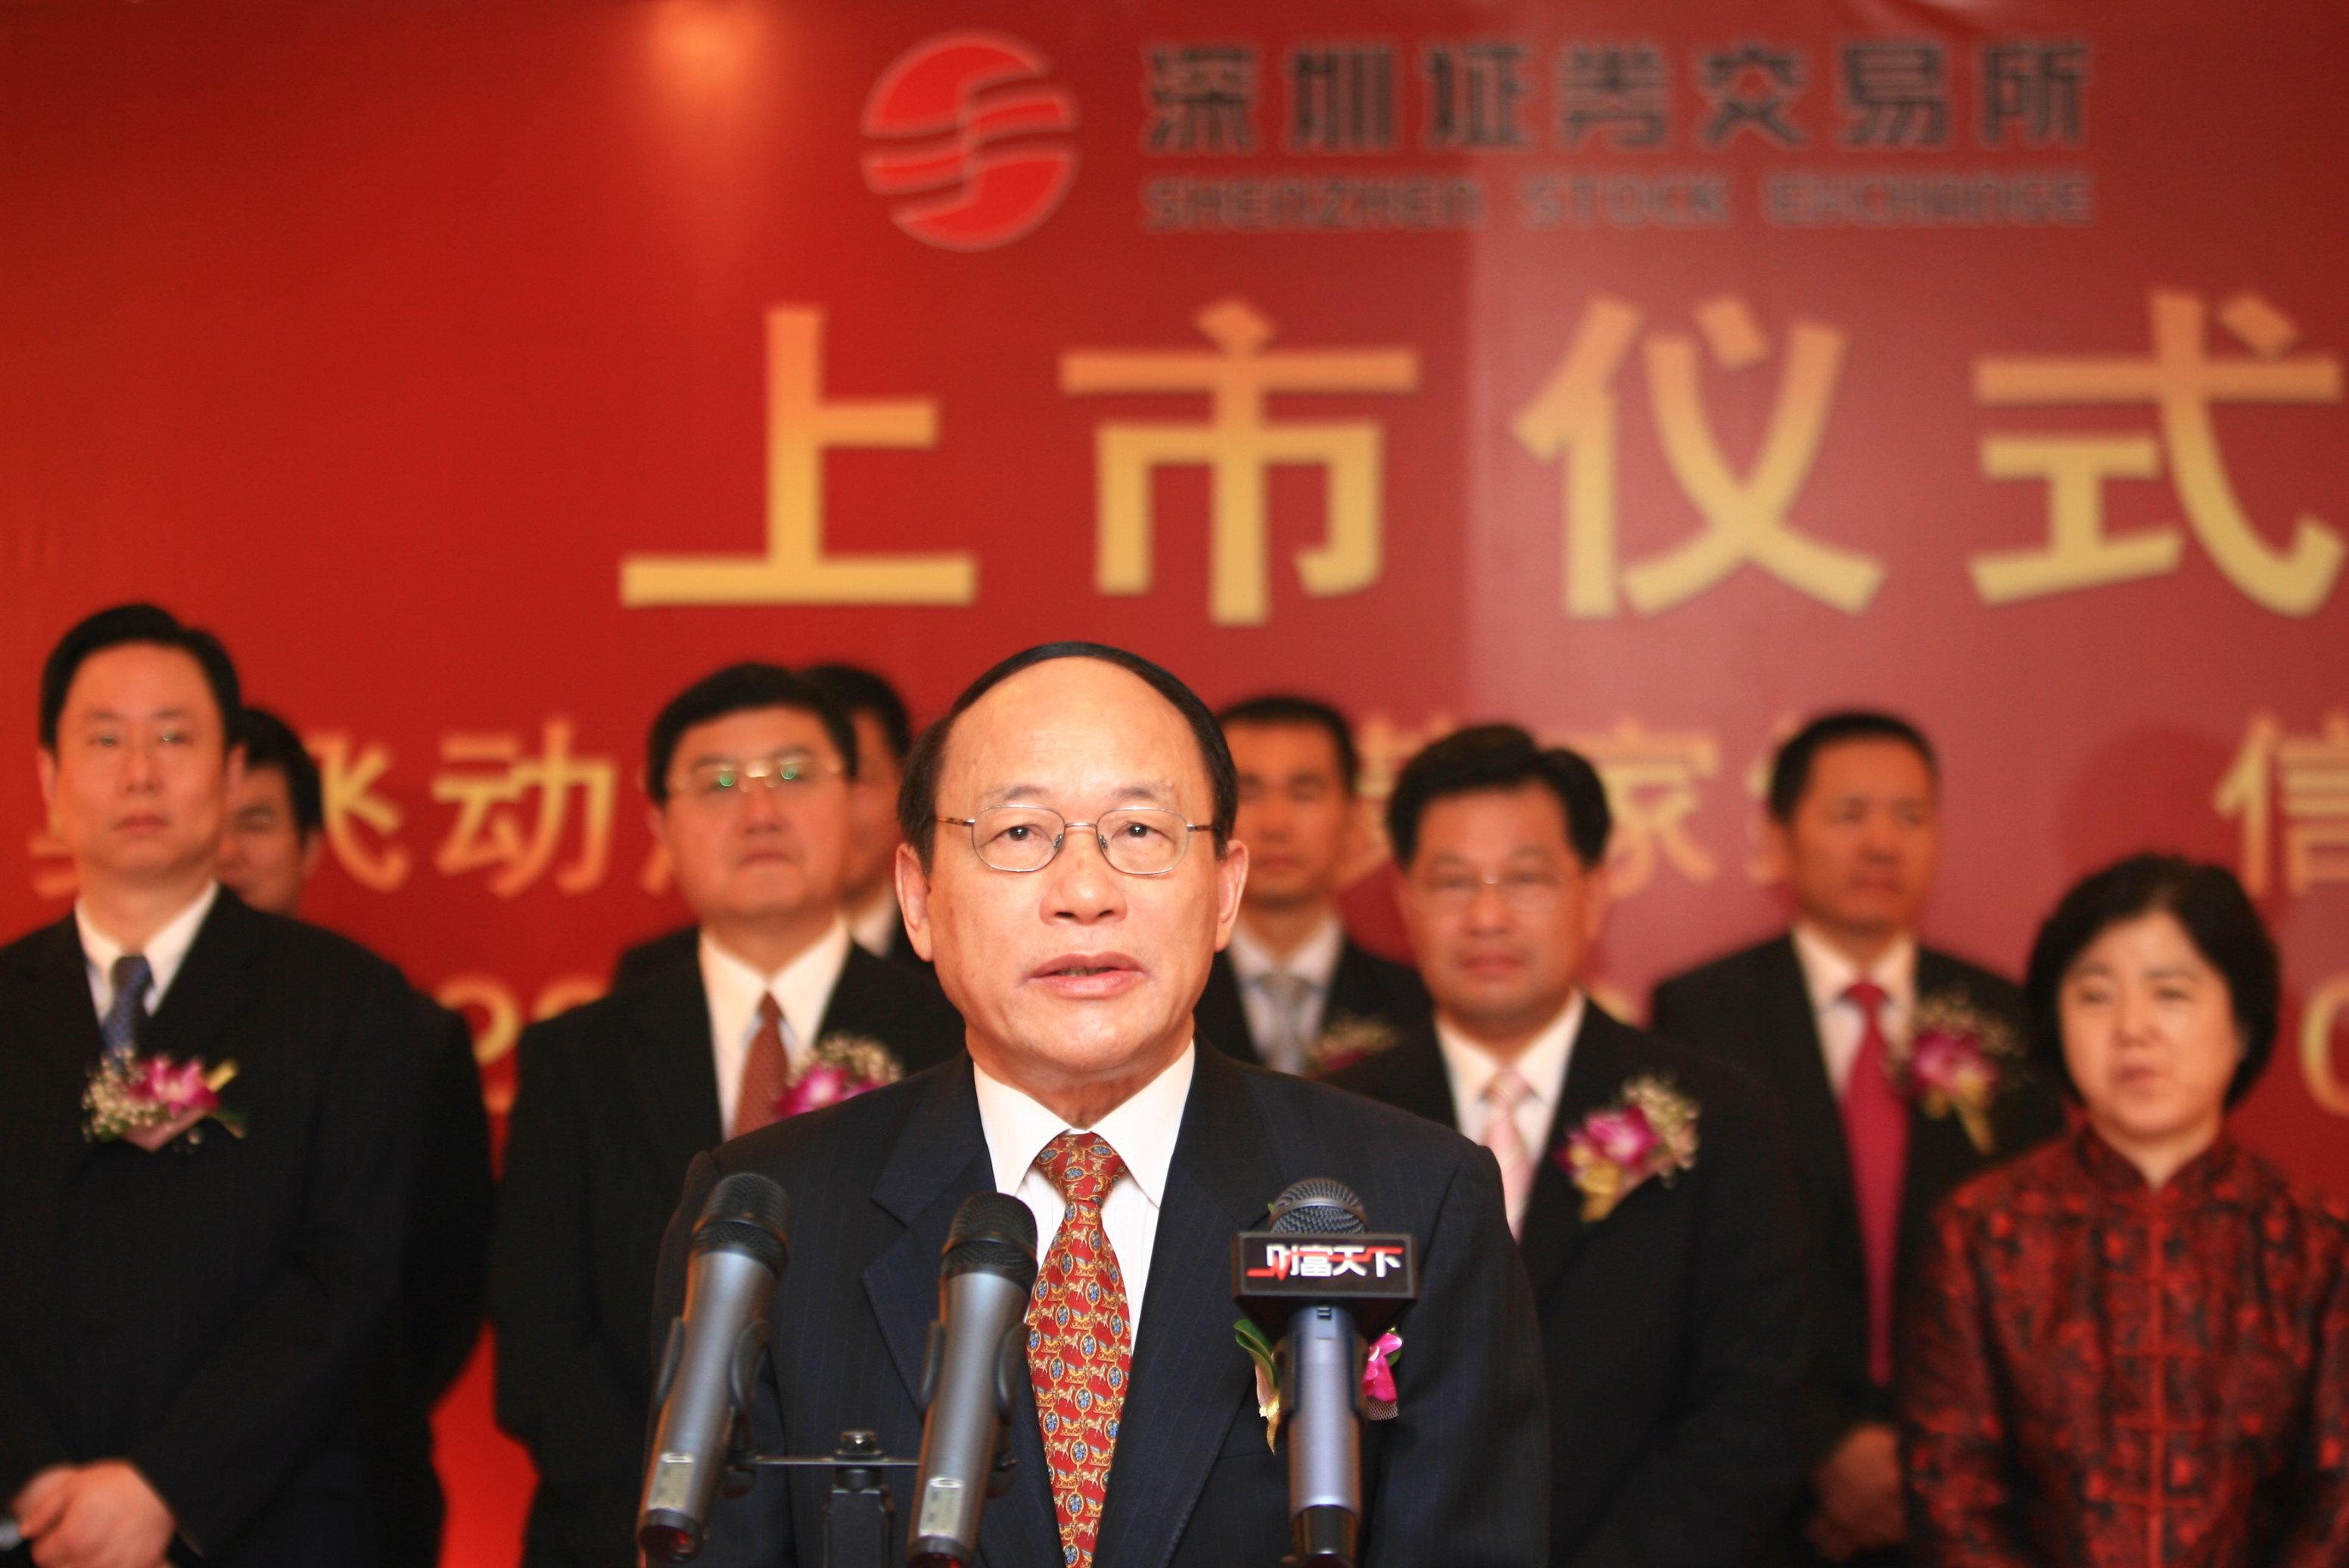 Ye Chenghai, front, chairman of Shenzhen Salubris Pharmaceuticals Co., Ltd., speaks during the ceremony...